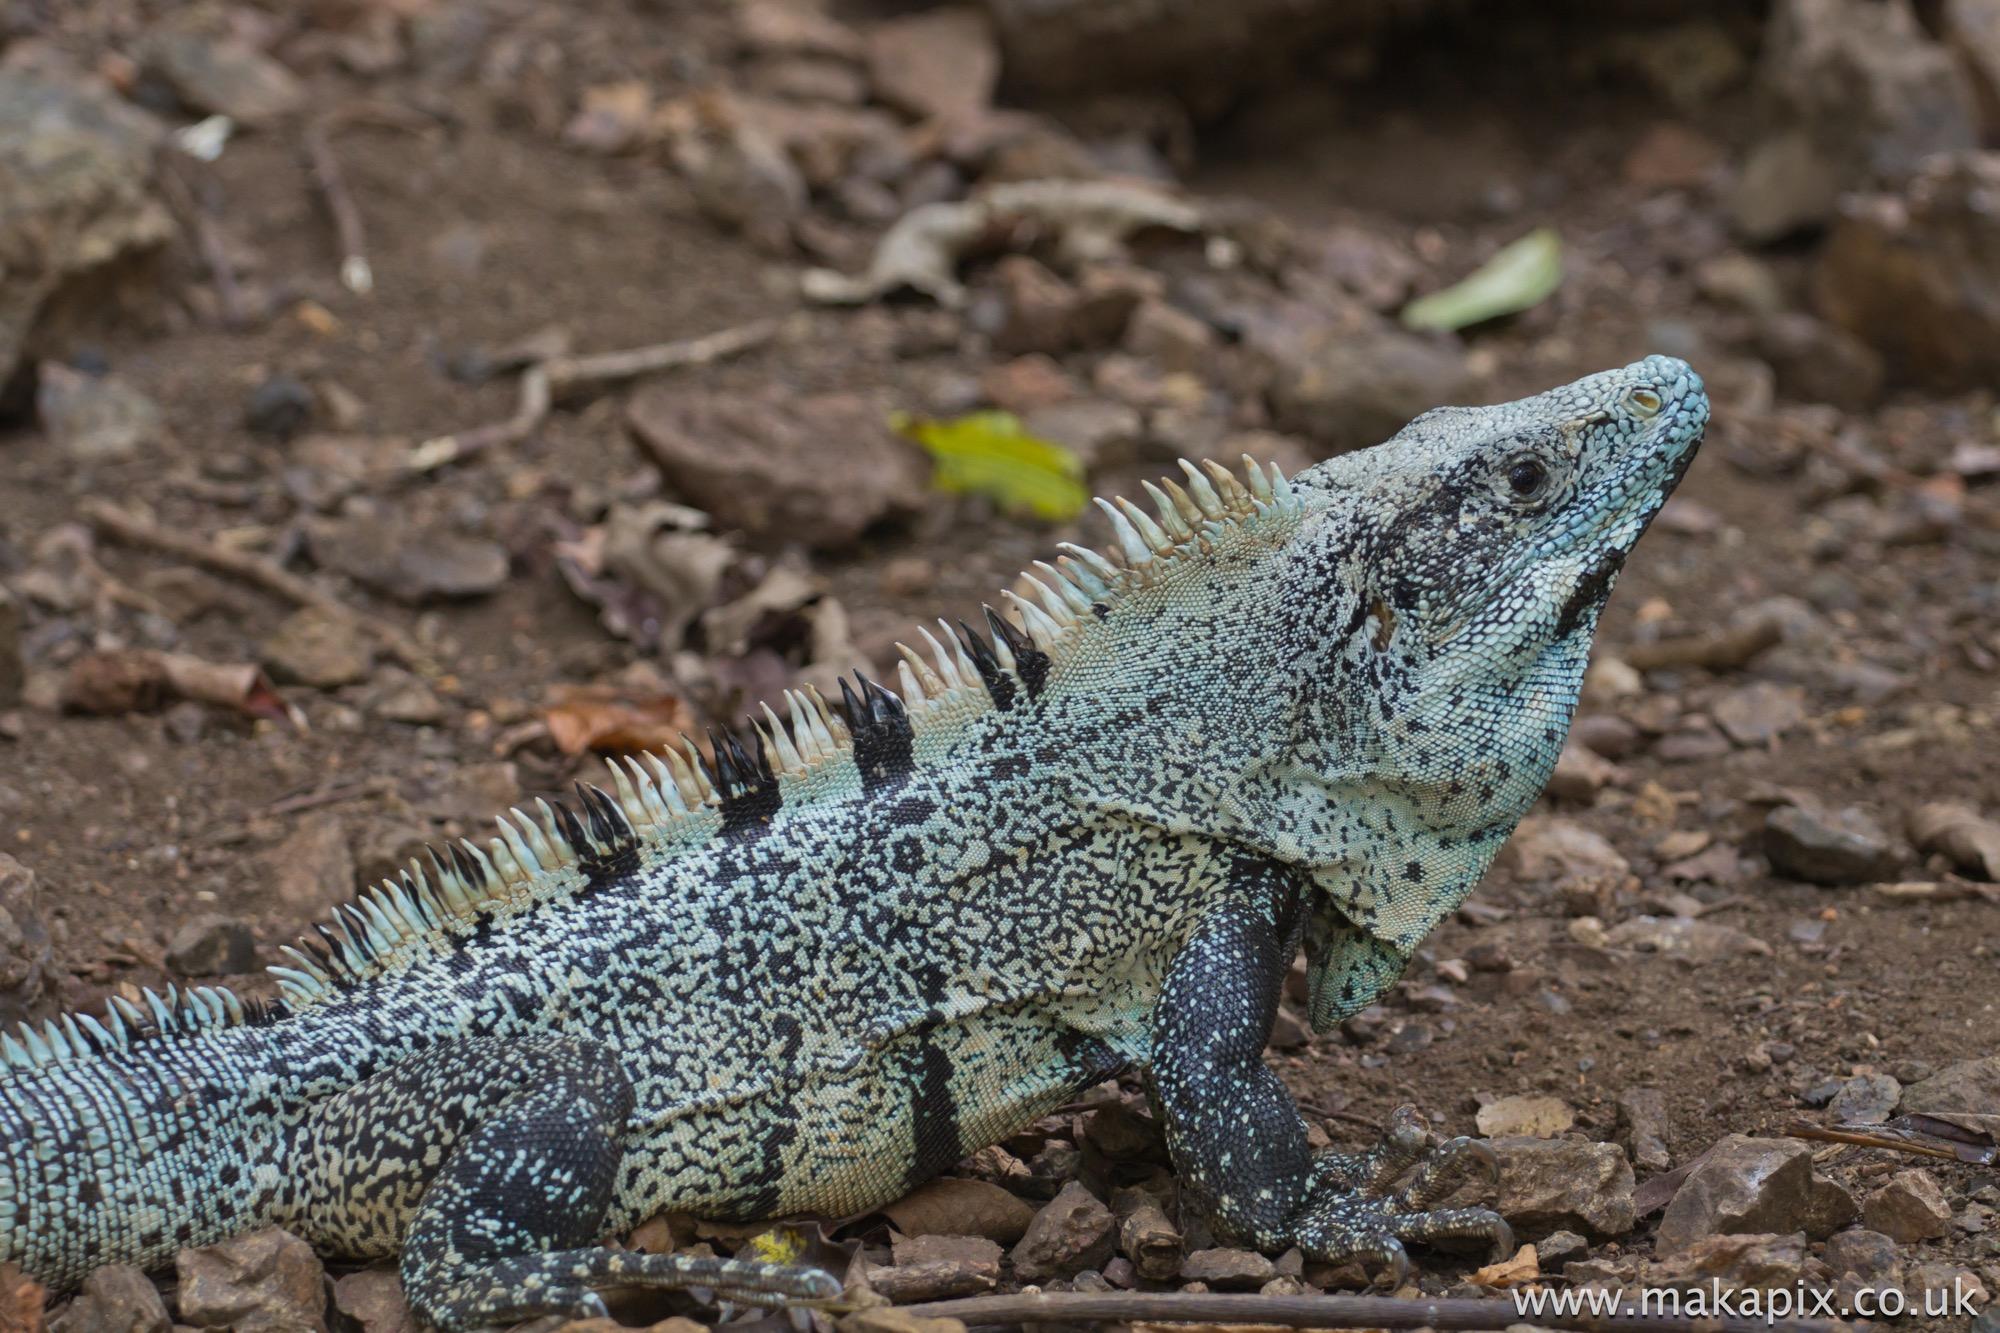 Ctenosaura Lizard, Costa Rica